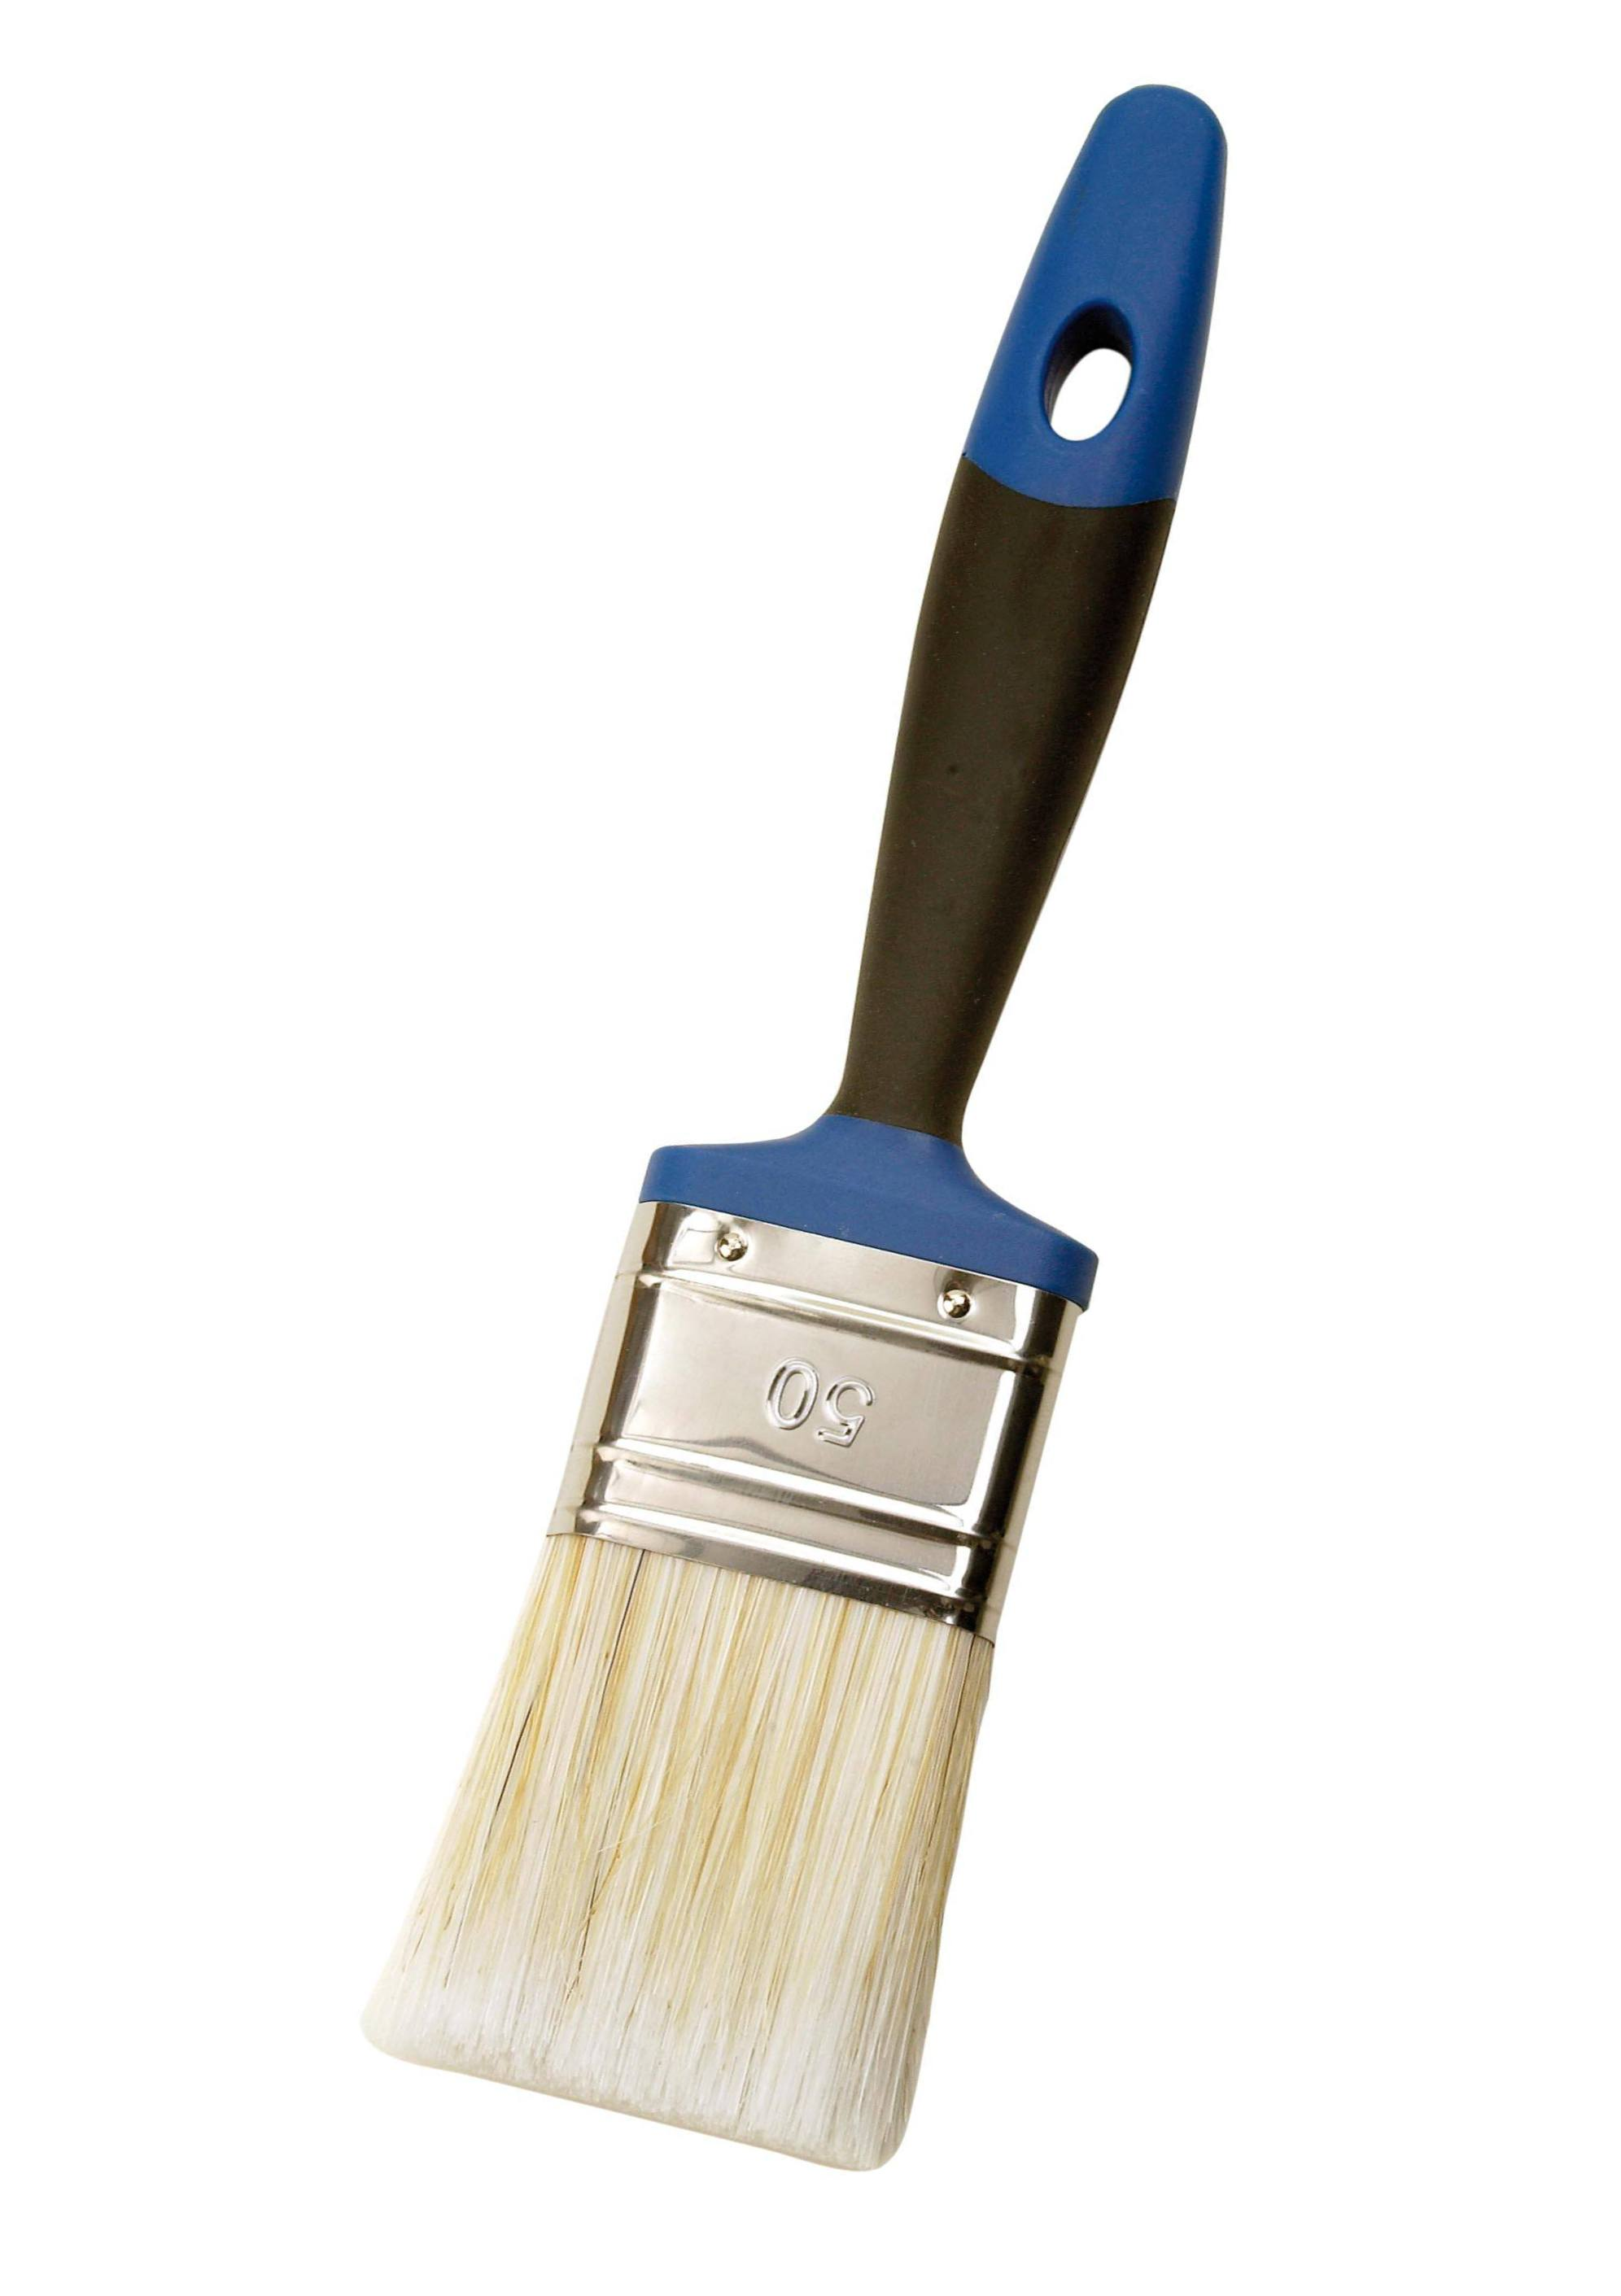 Dicke:14 mm mako Lack Flachpinsel mit ERGO-Griff Pinsel f/ür Lacke Lackpinsel in 3 Gr/ö/ßen Breite:50 mm